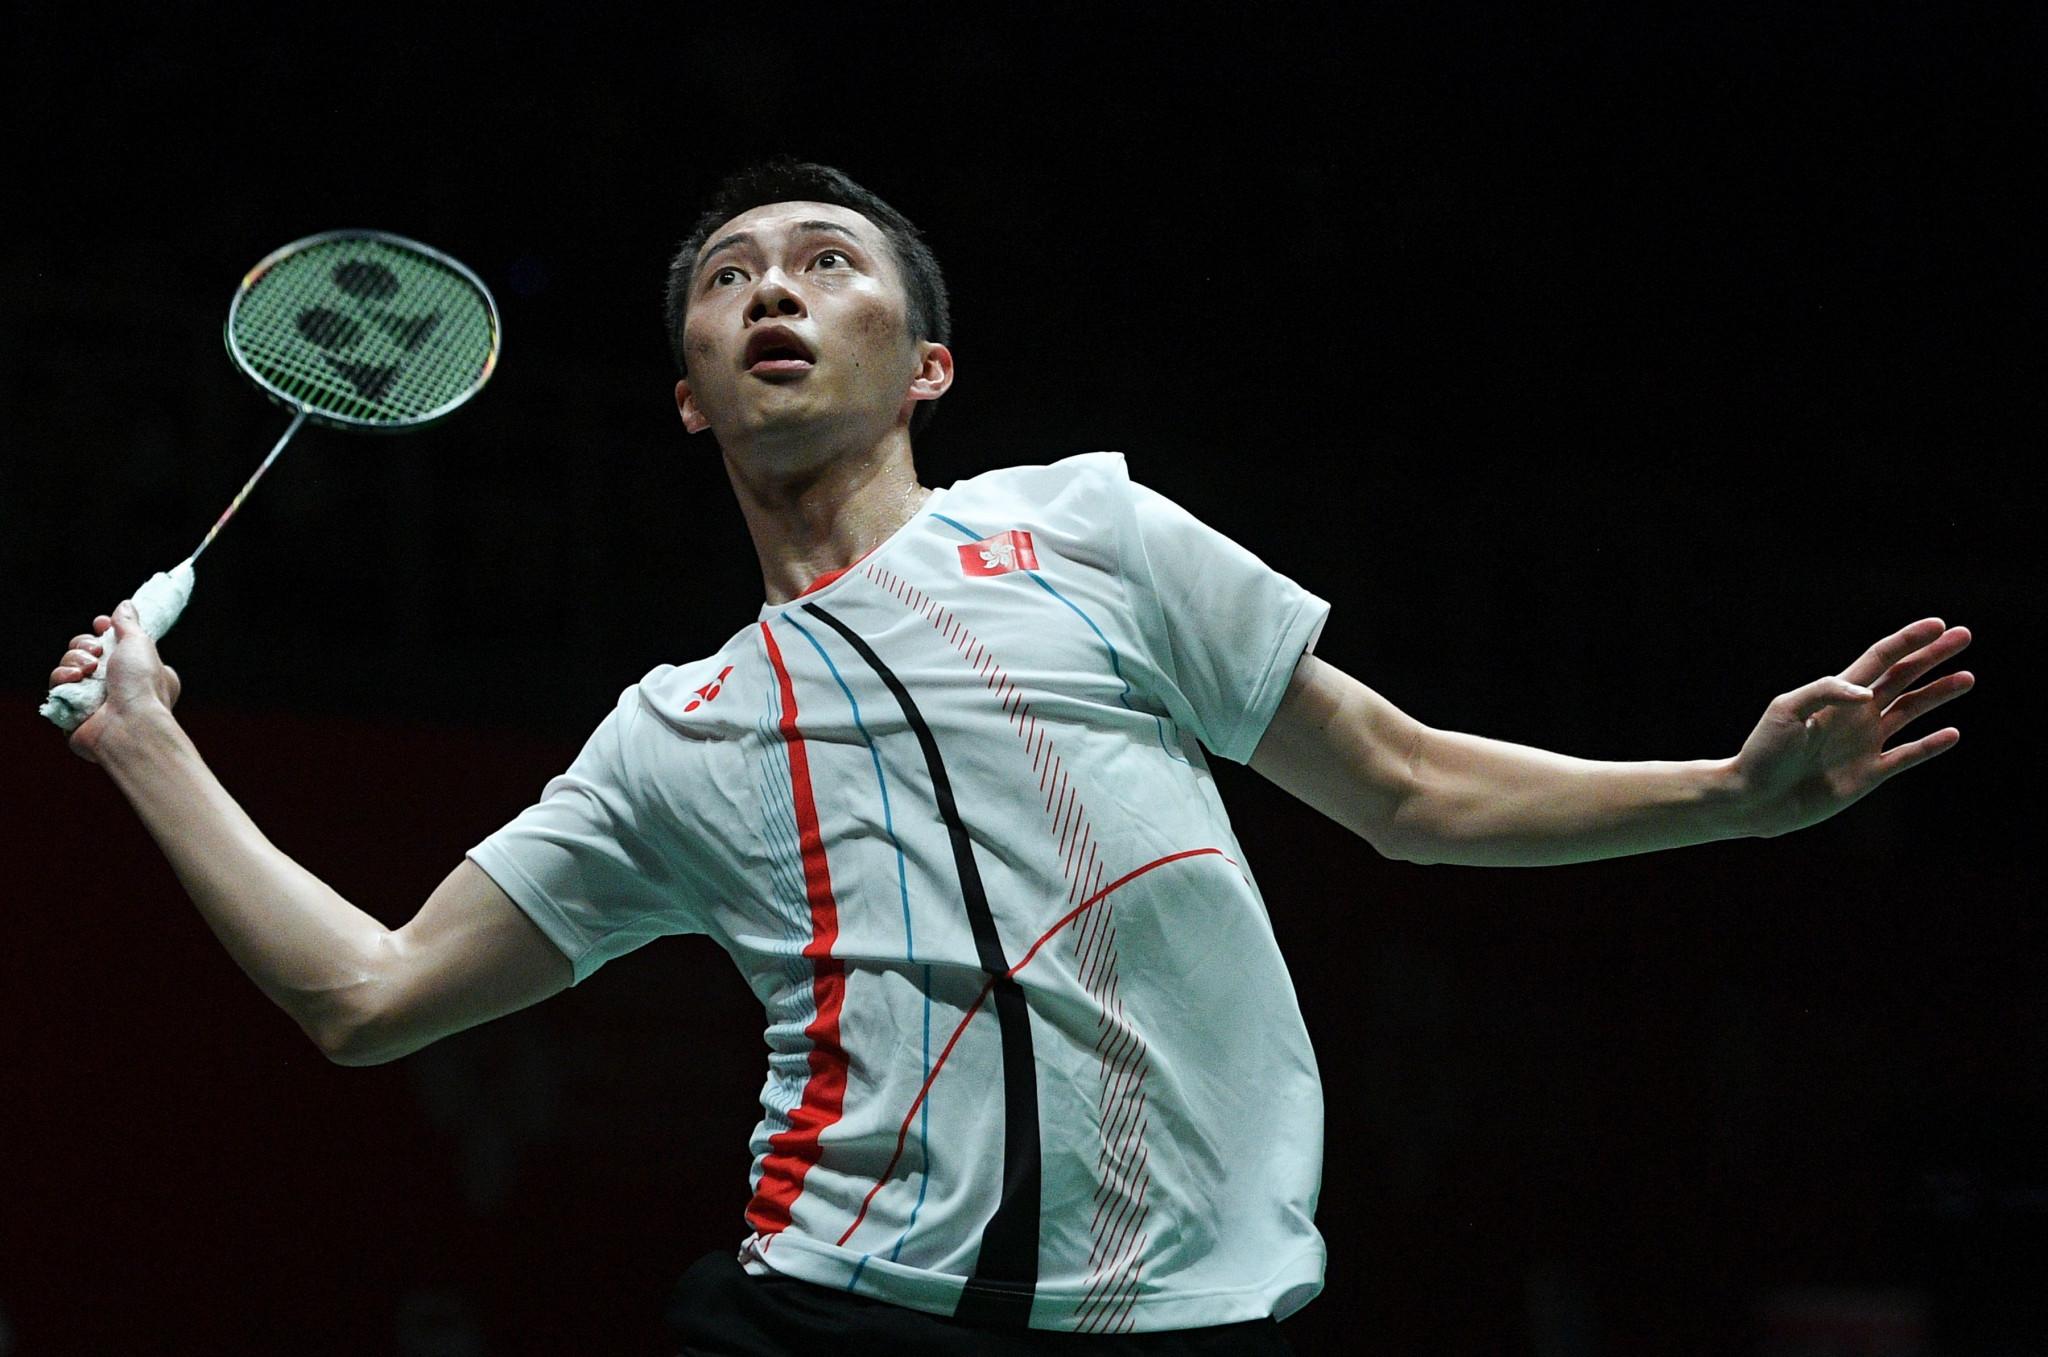 Angus Ng Ka Long advanced to the men's singles final ©Getty Images